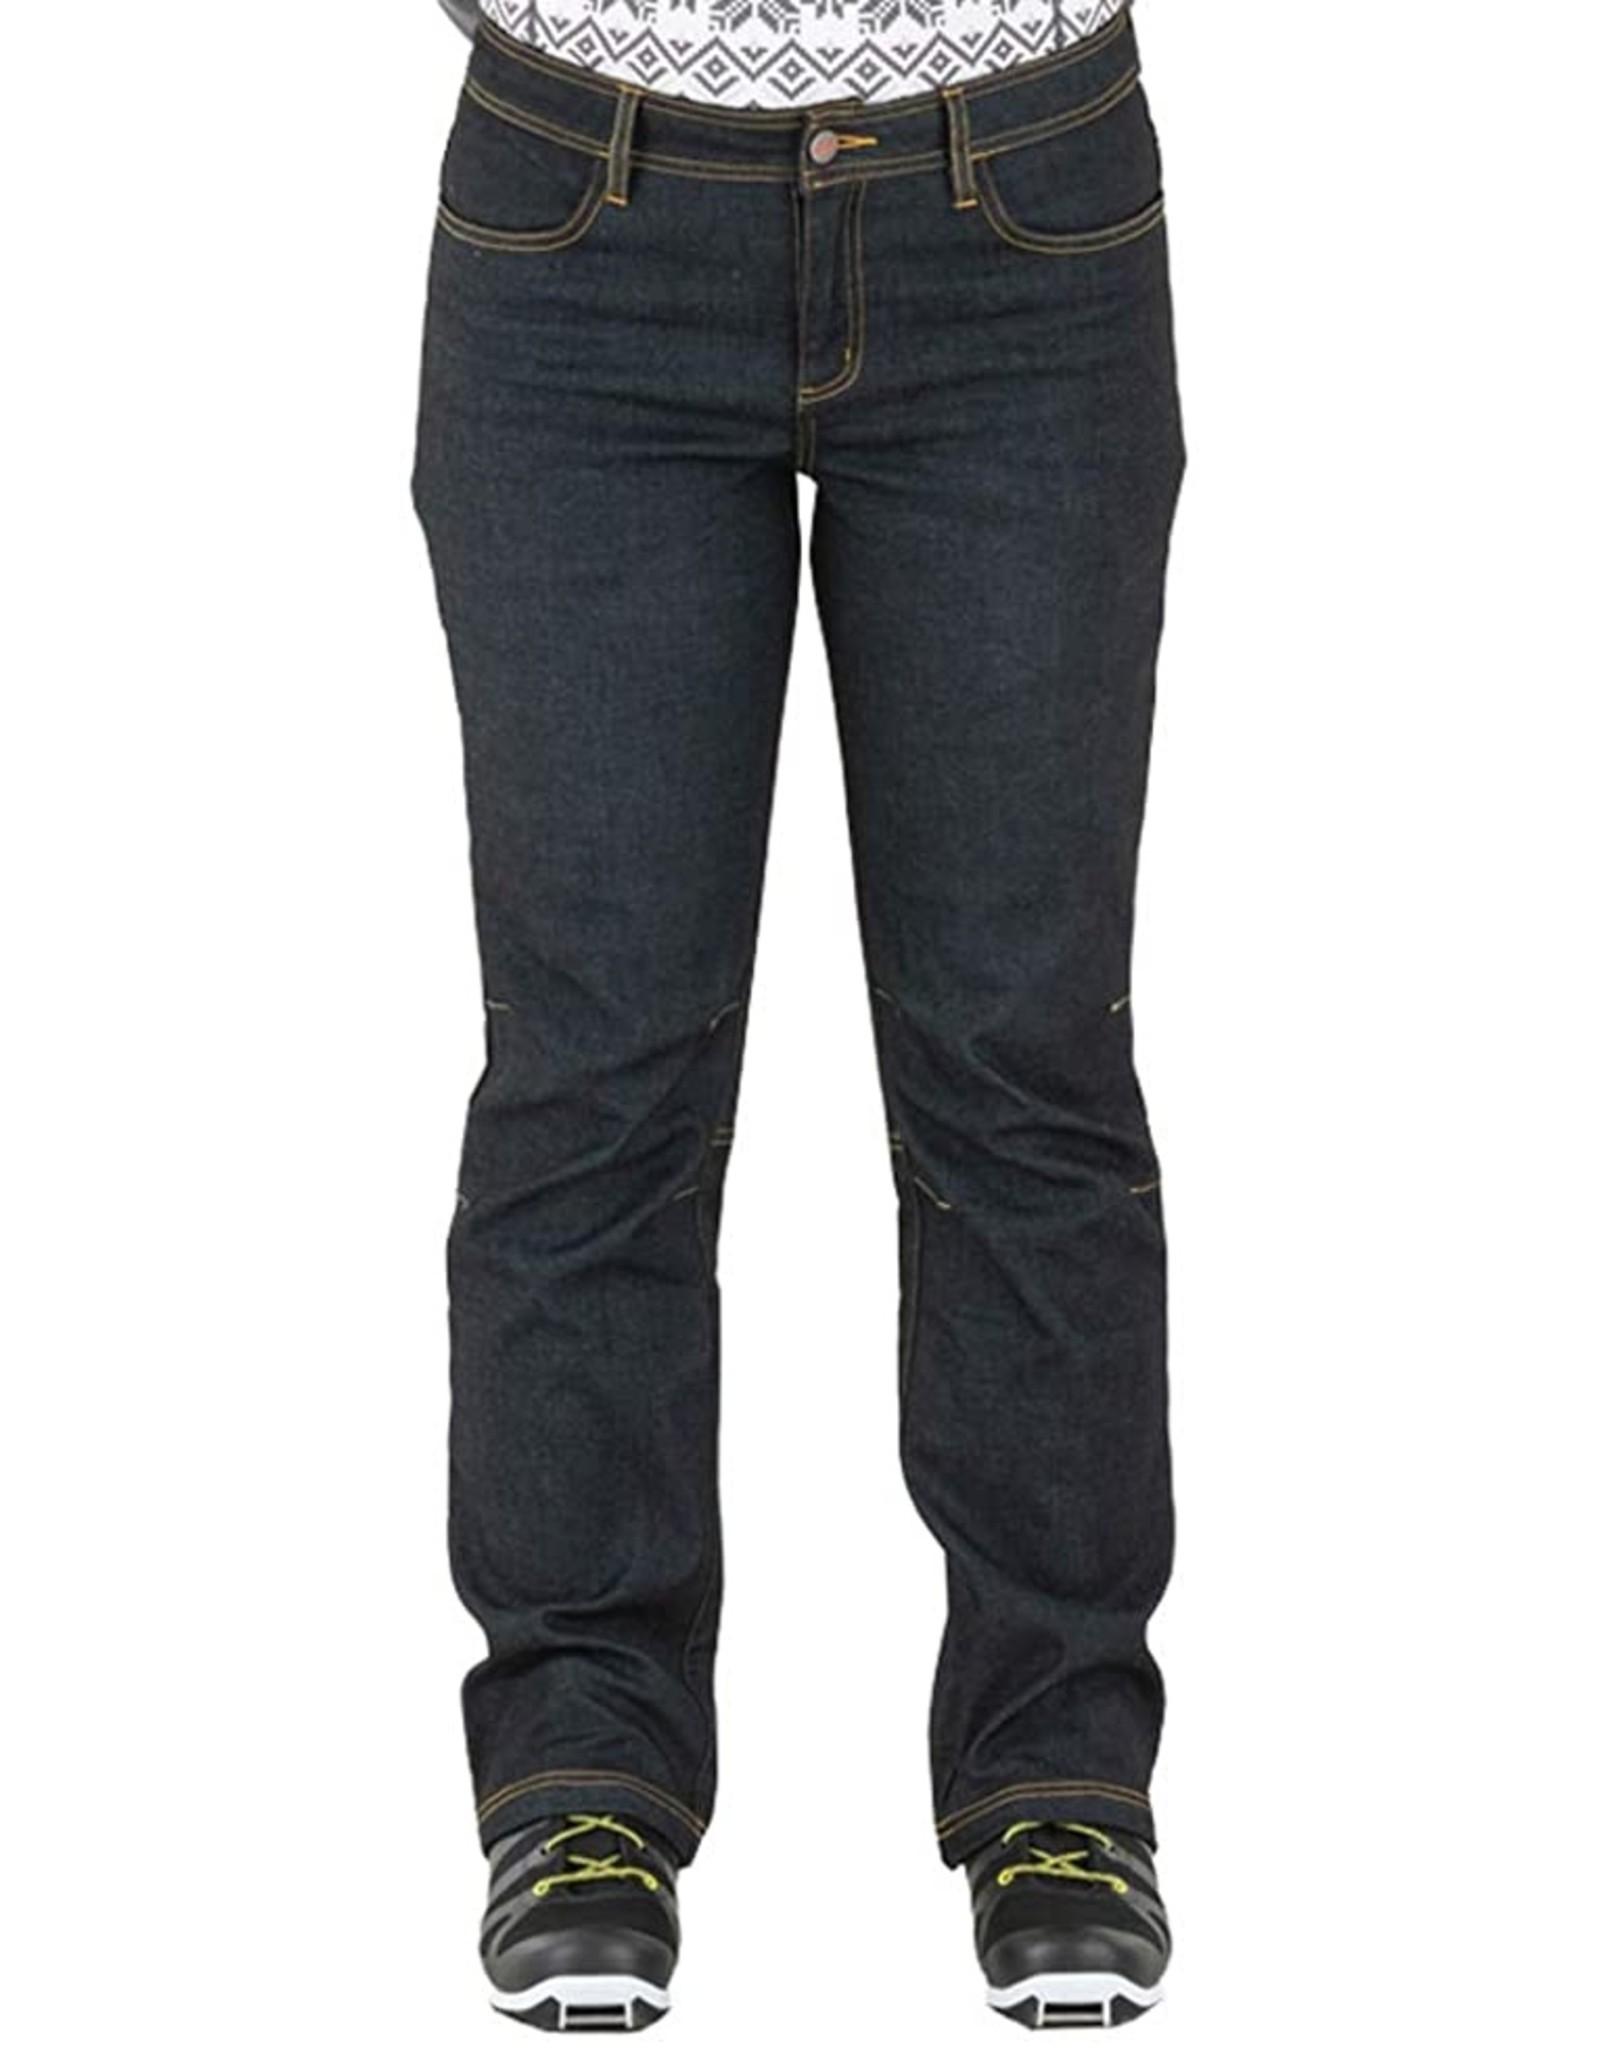 Swix Tavern Stretch Denim Pant XL (74000) Denim